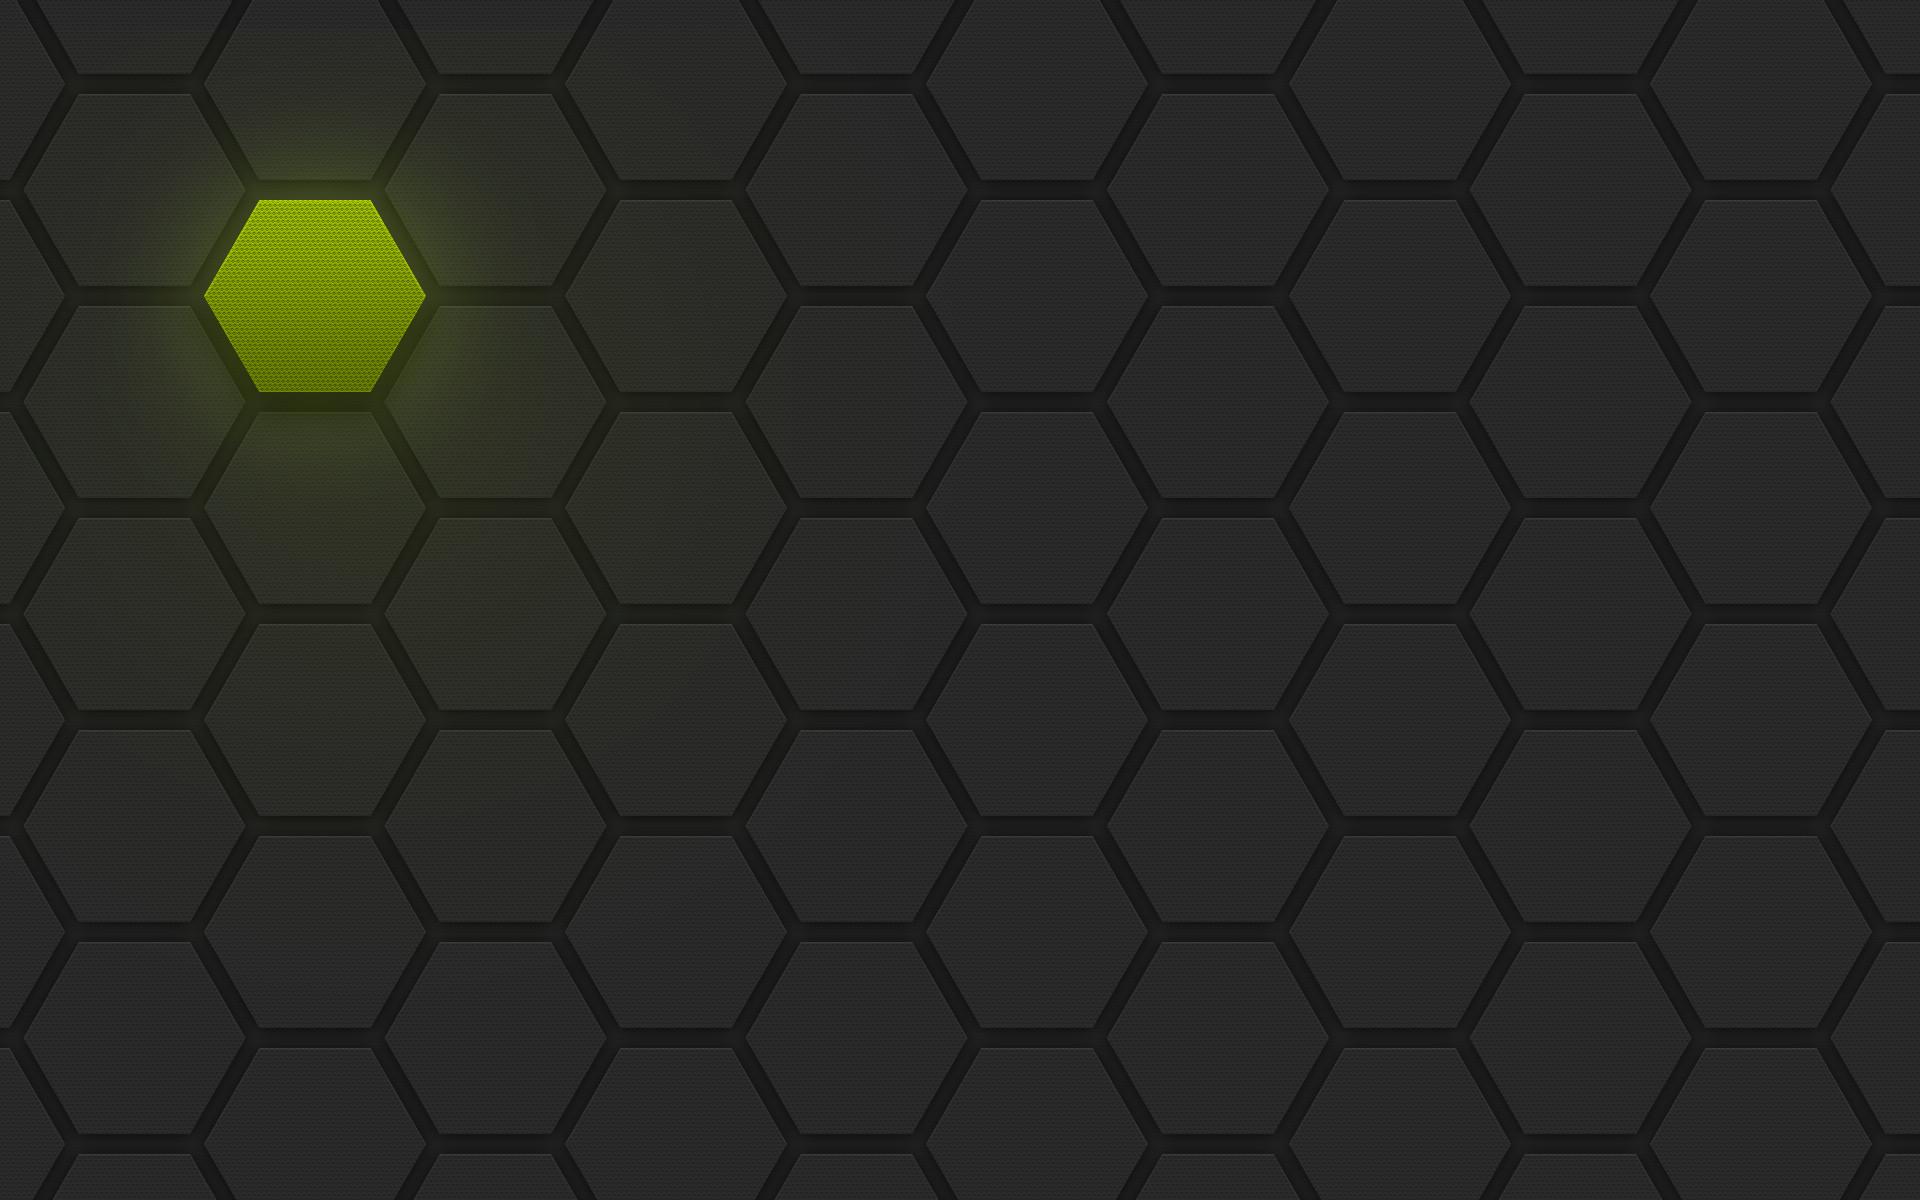 Hexagon Wallpaper 1145